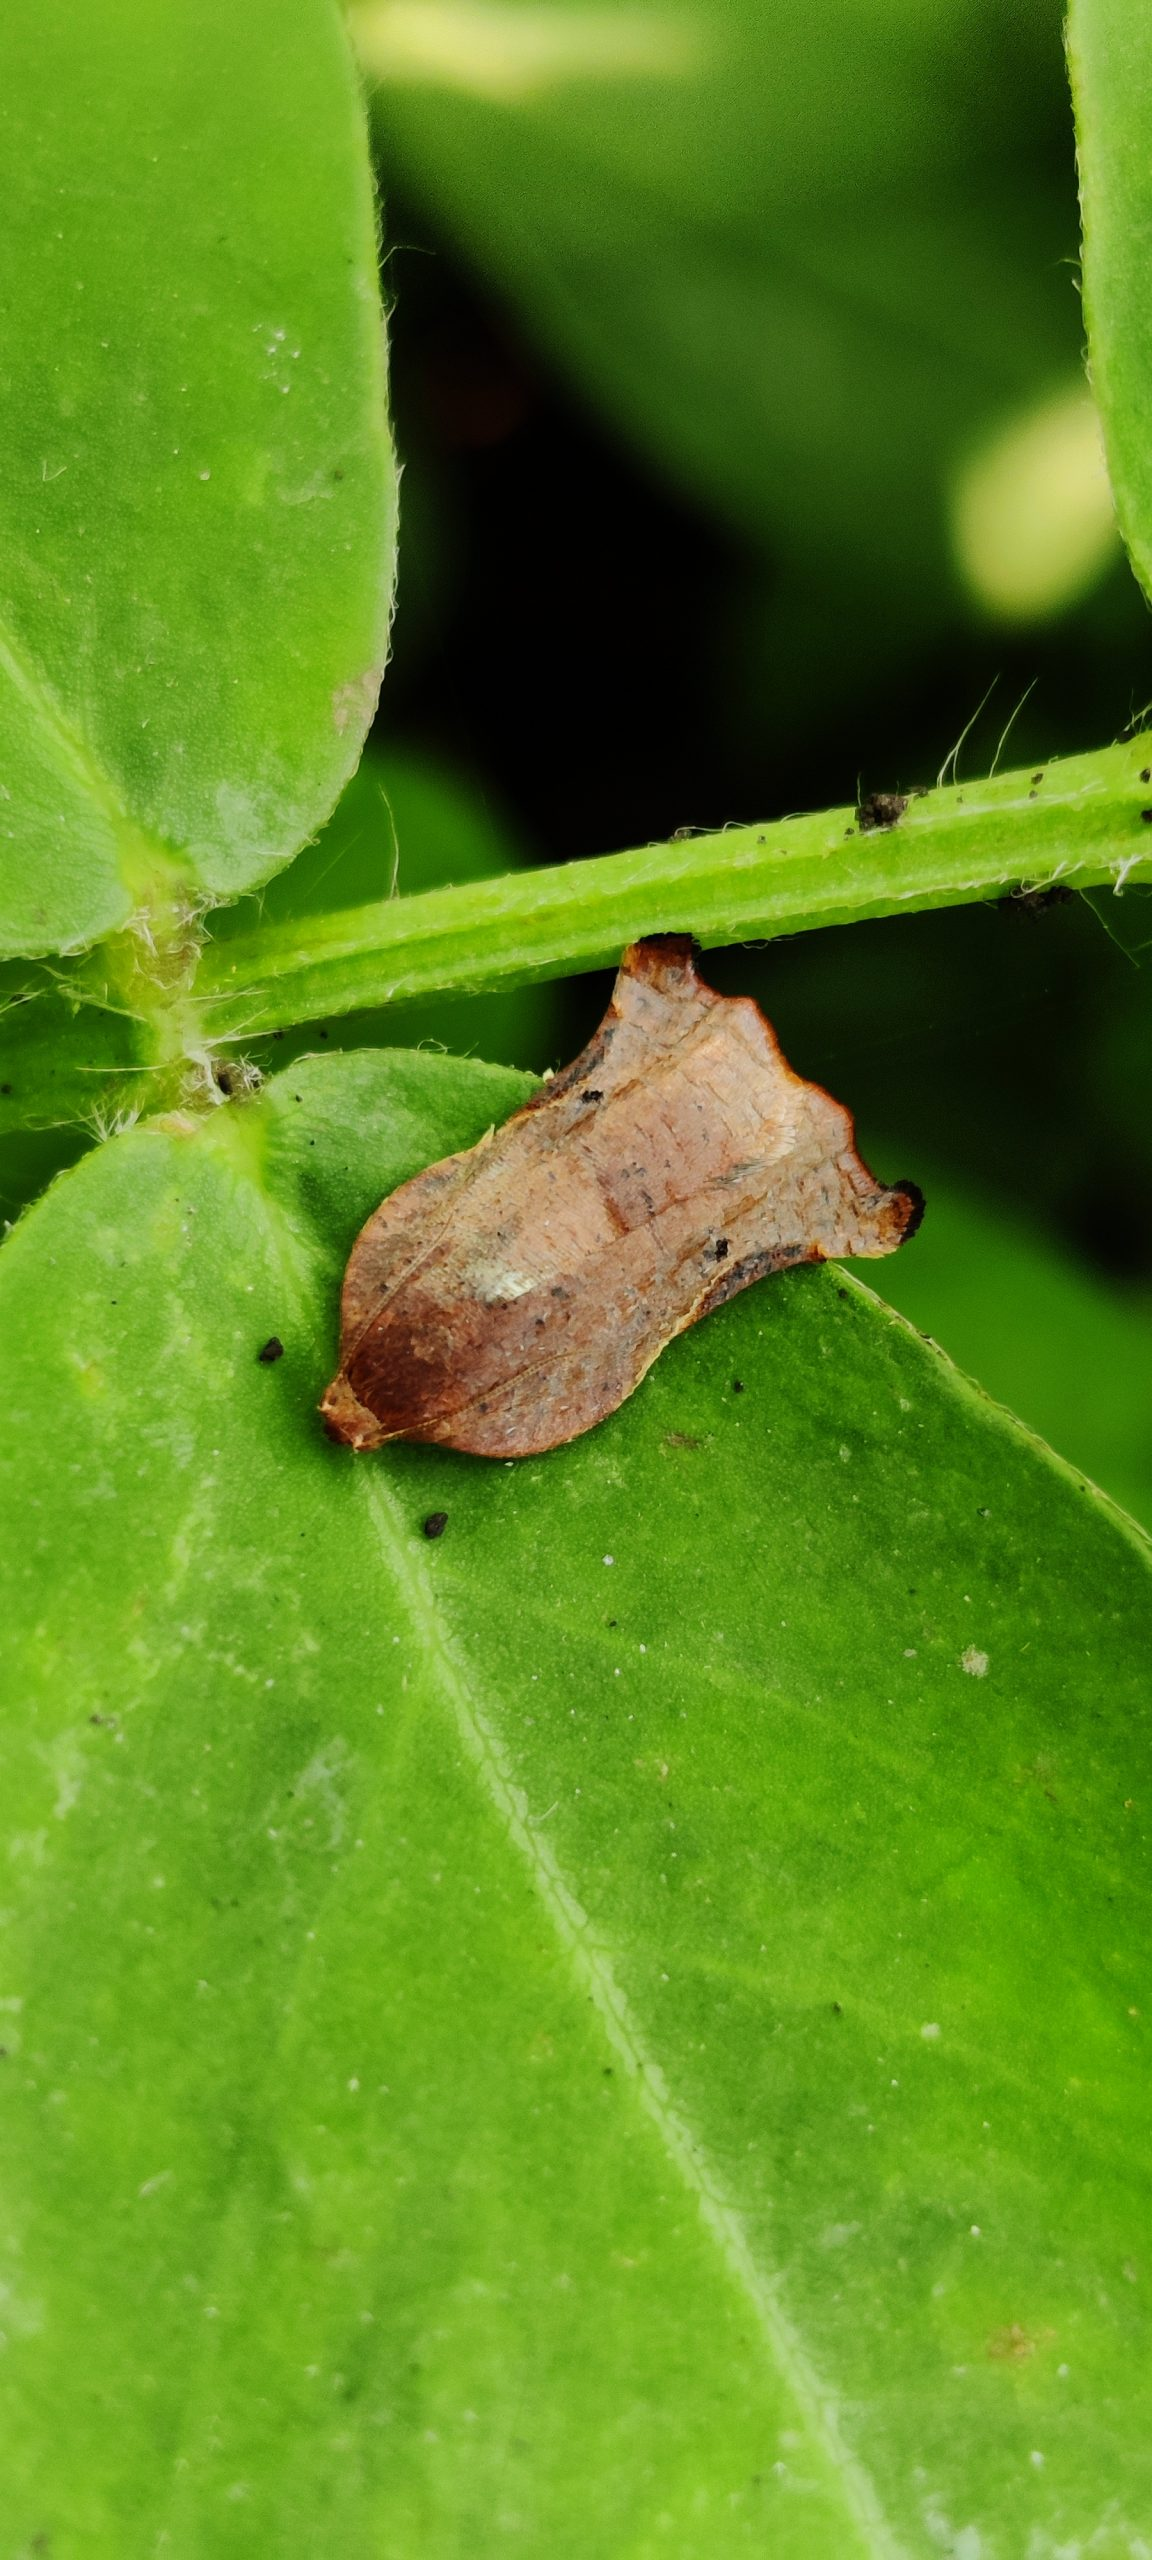 Homona moth on a leaf